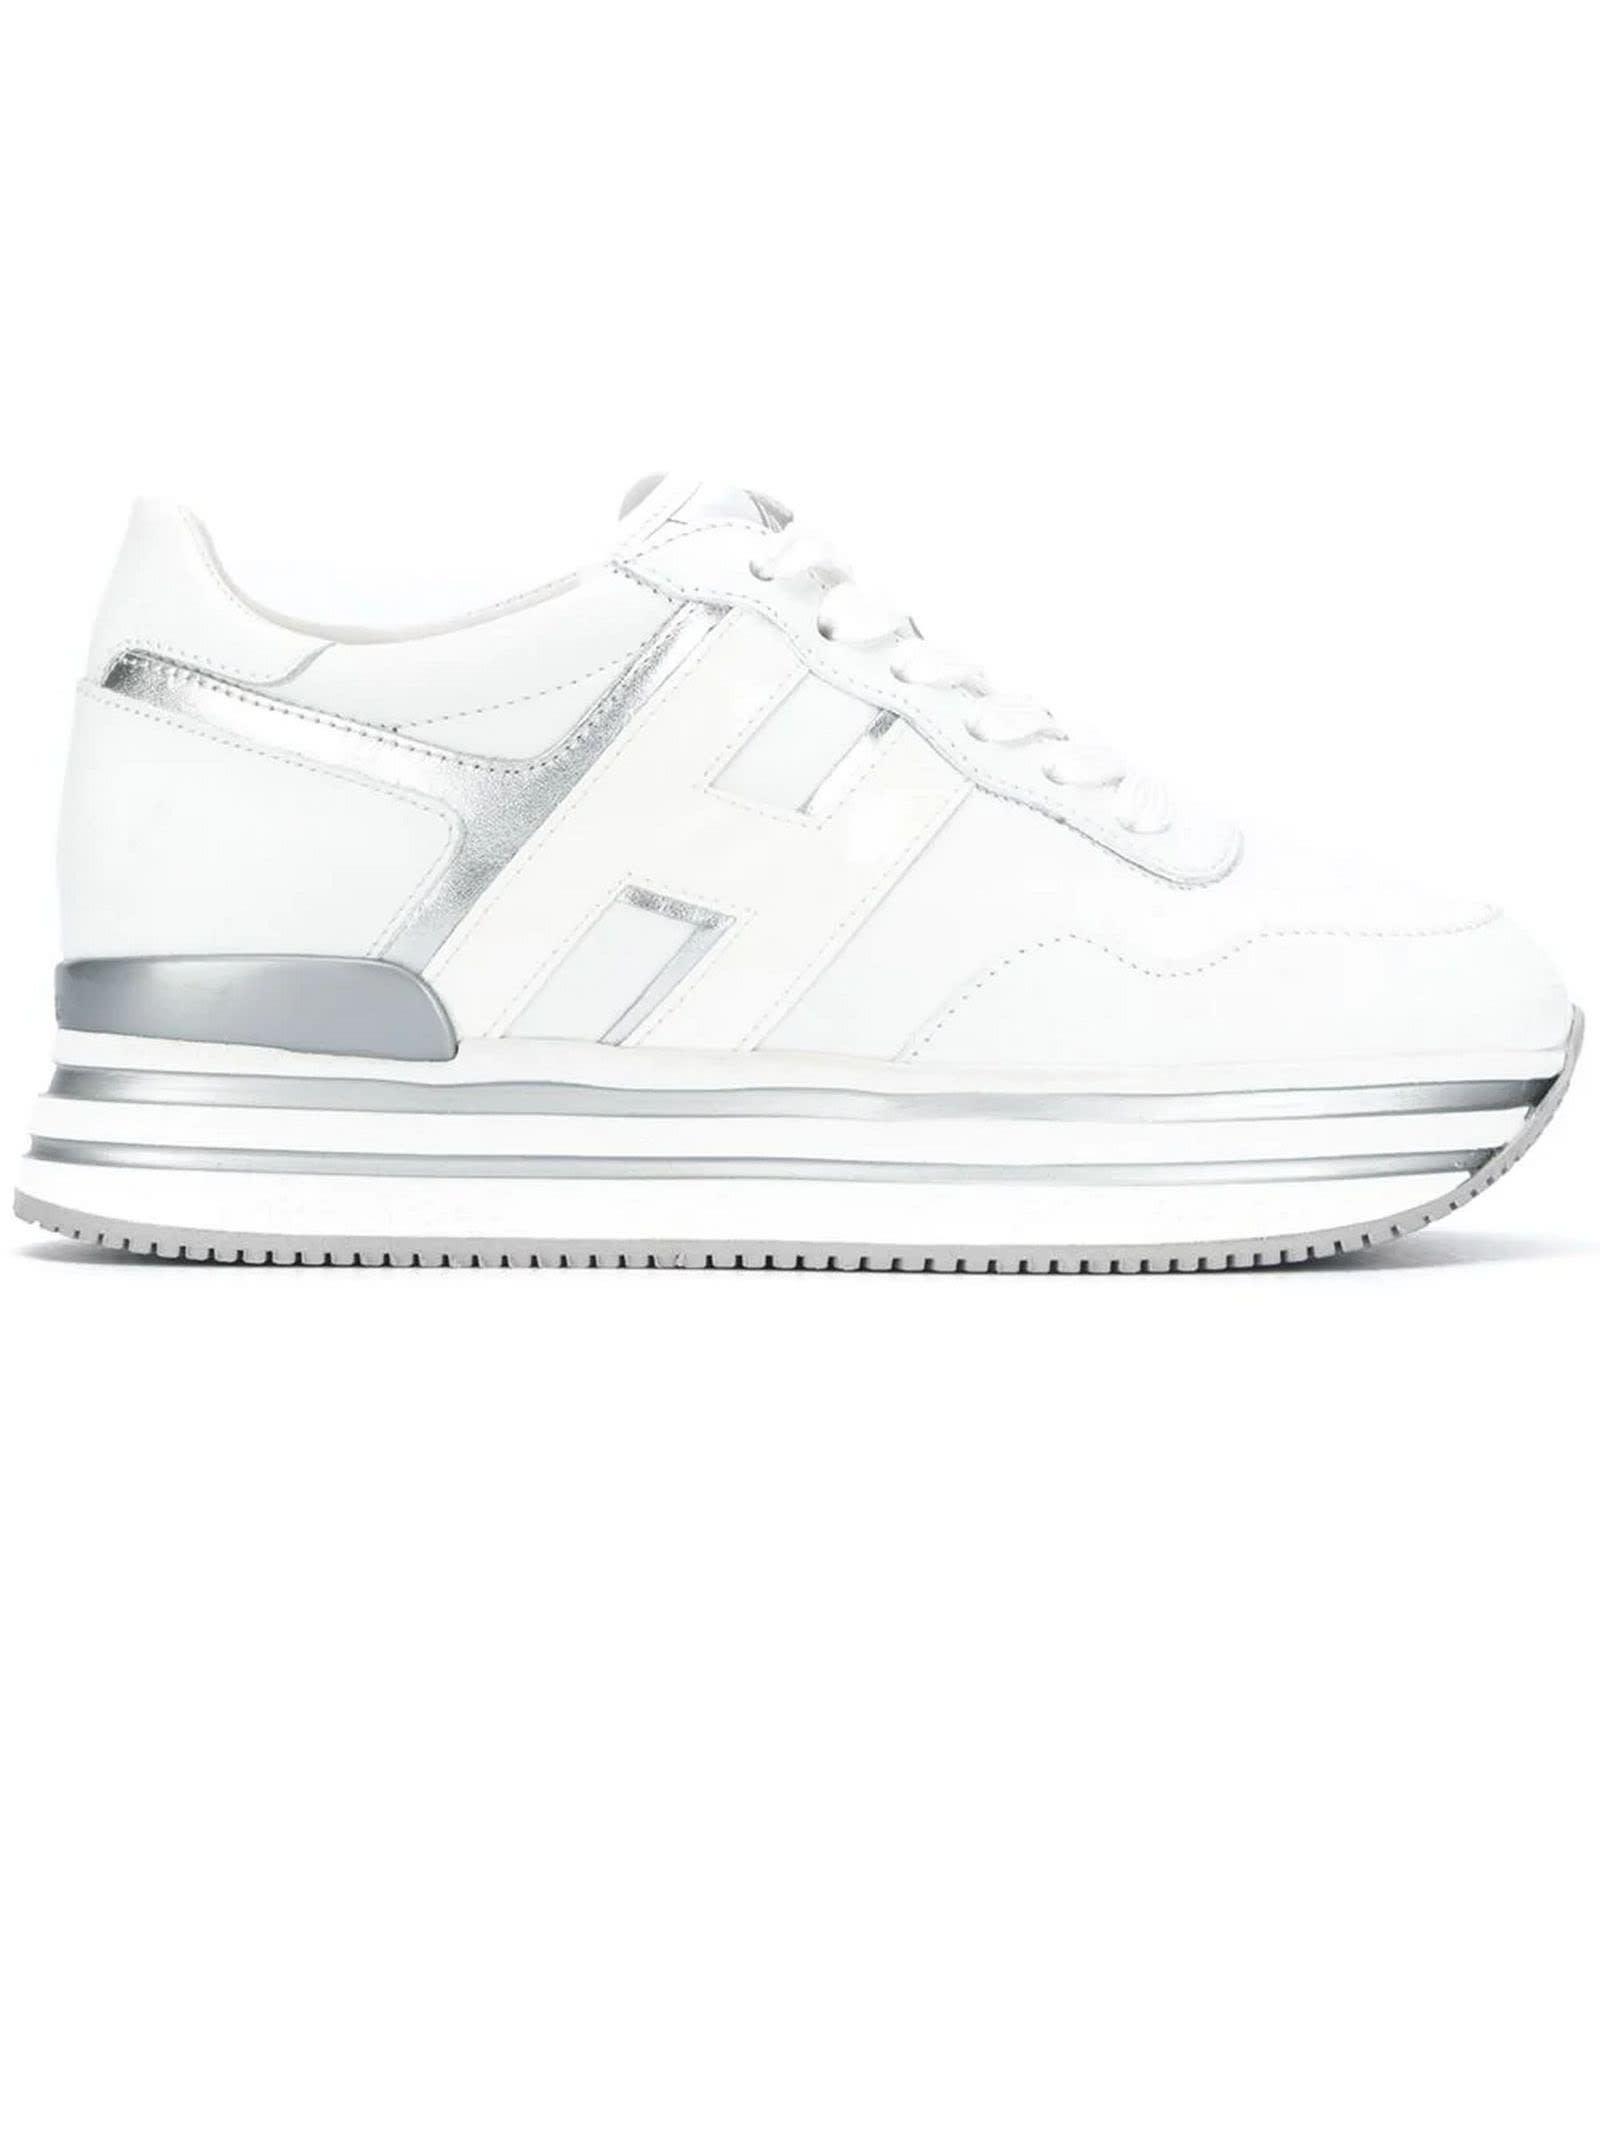 Hogan Midi H222 Silver, White